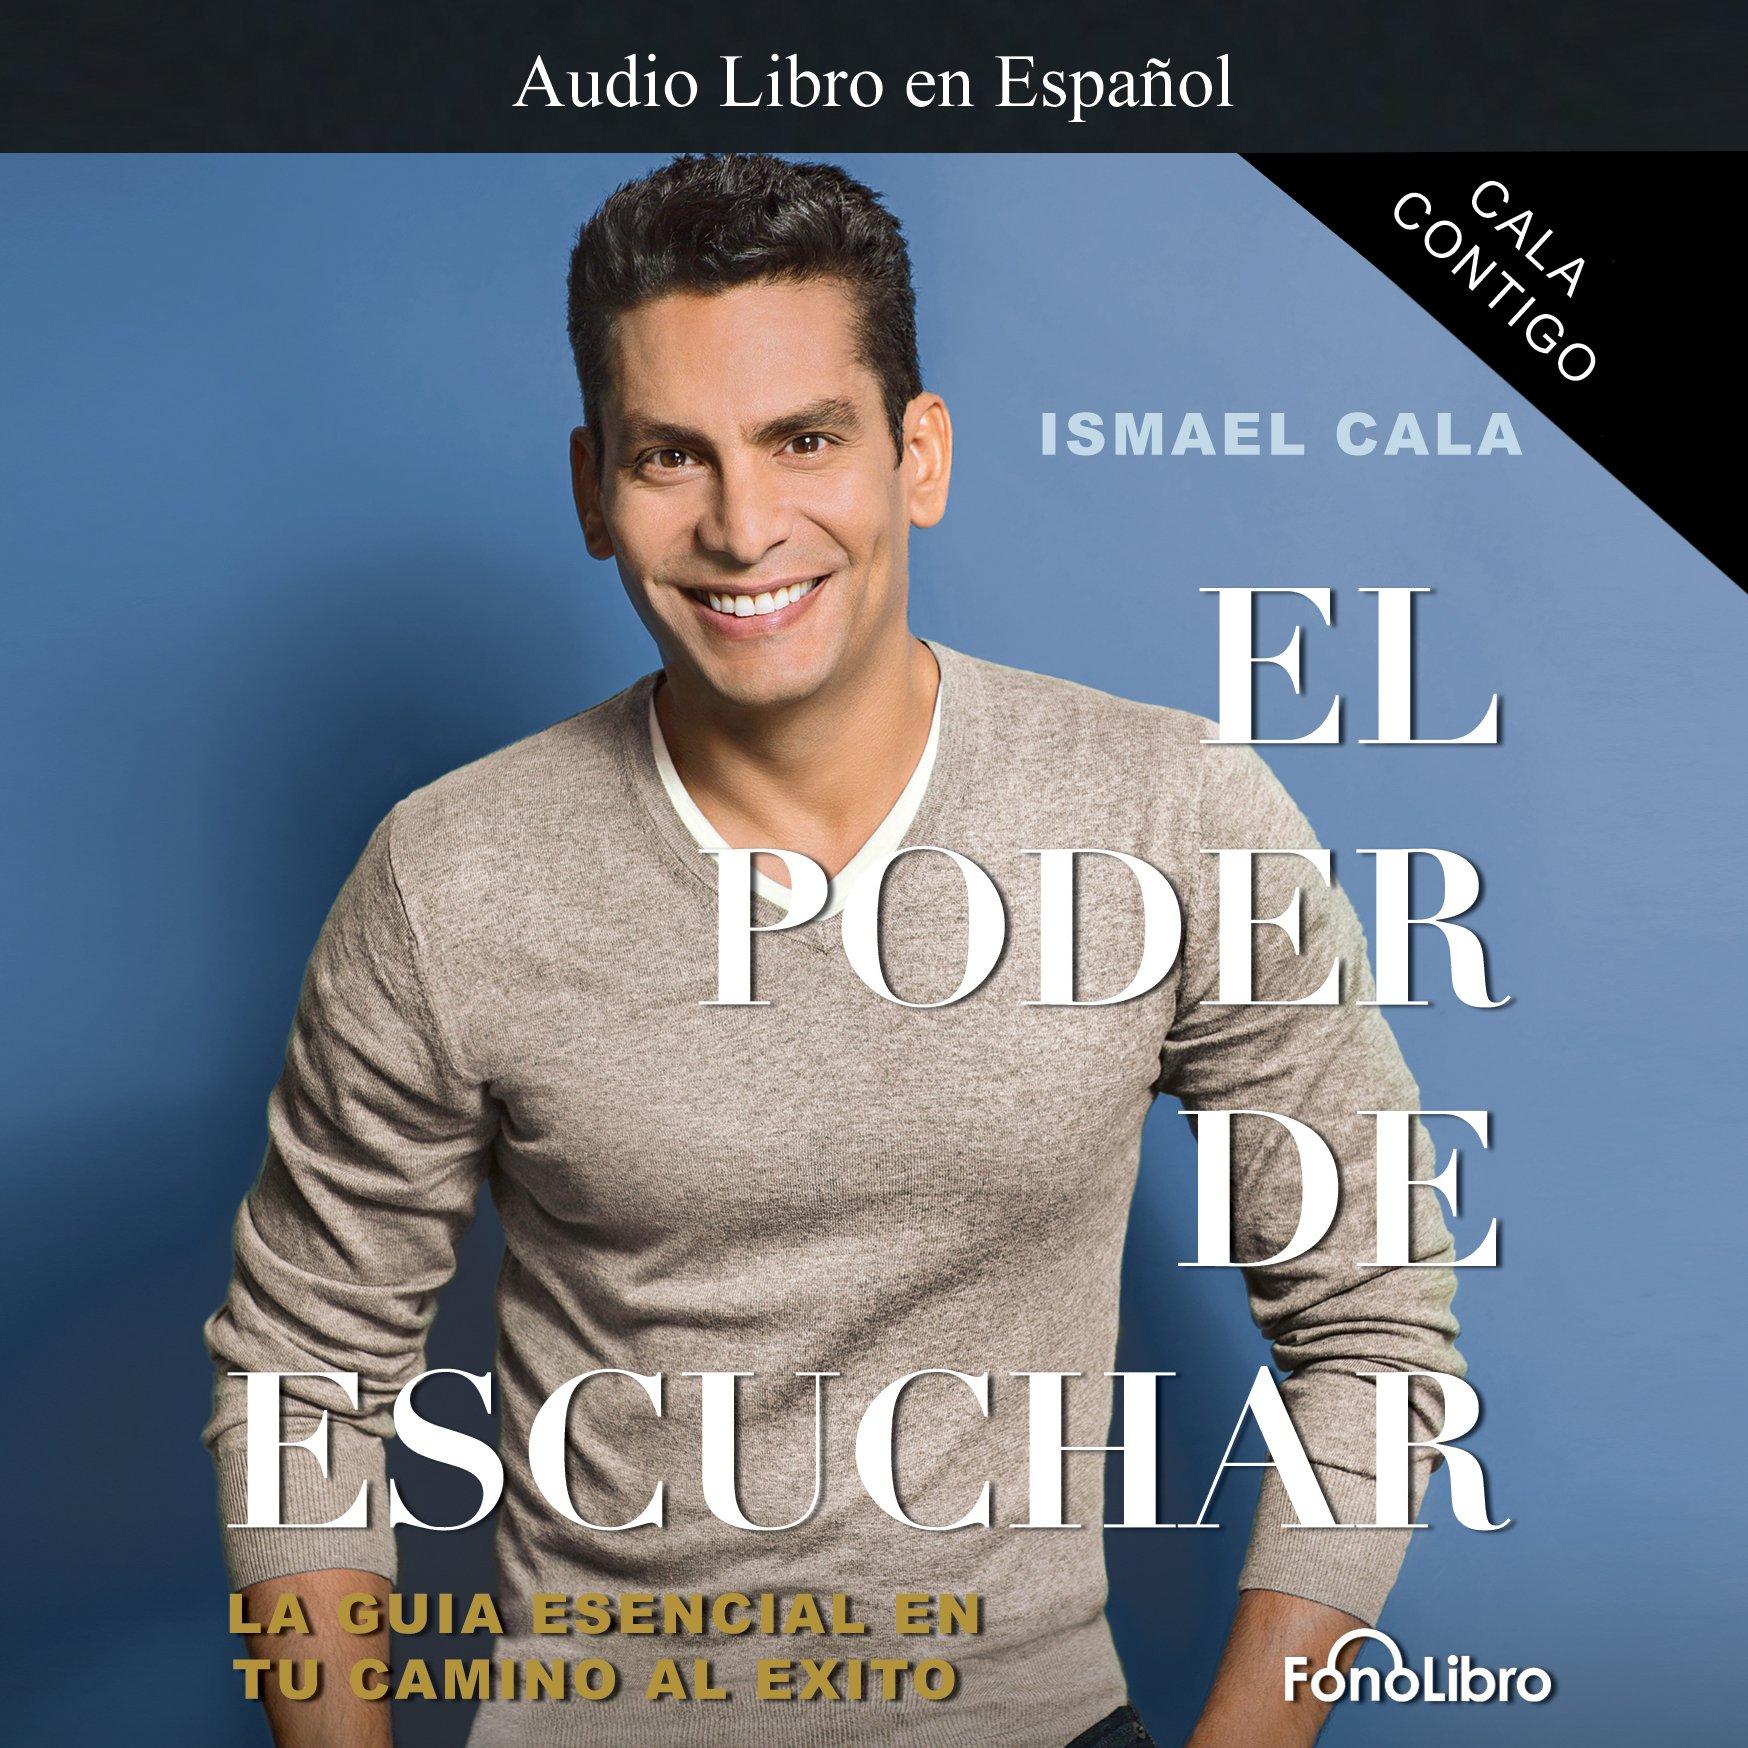 Cala Contigo: El Poder de Escuchar [Cala with You: The Power of Listening]